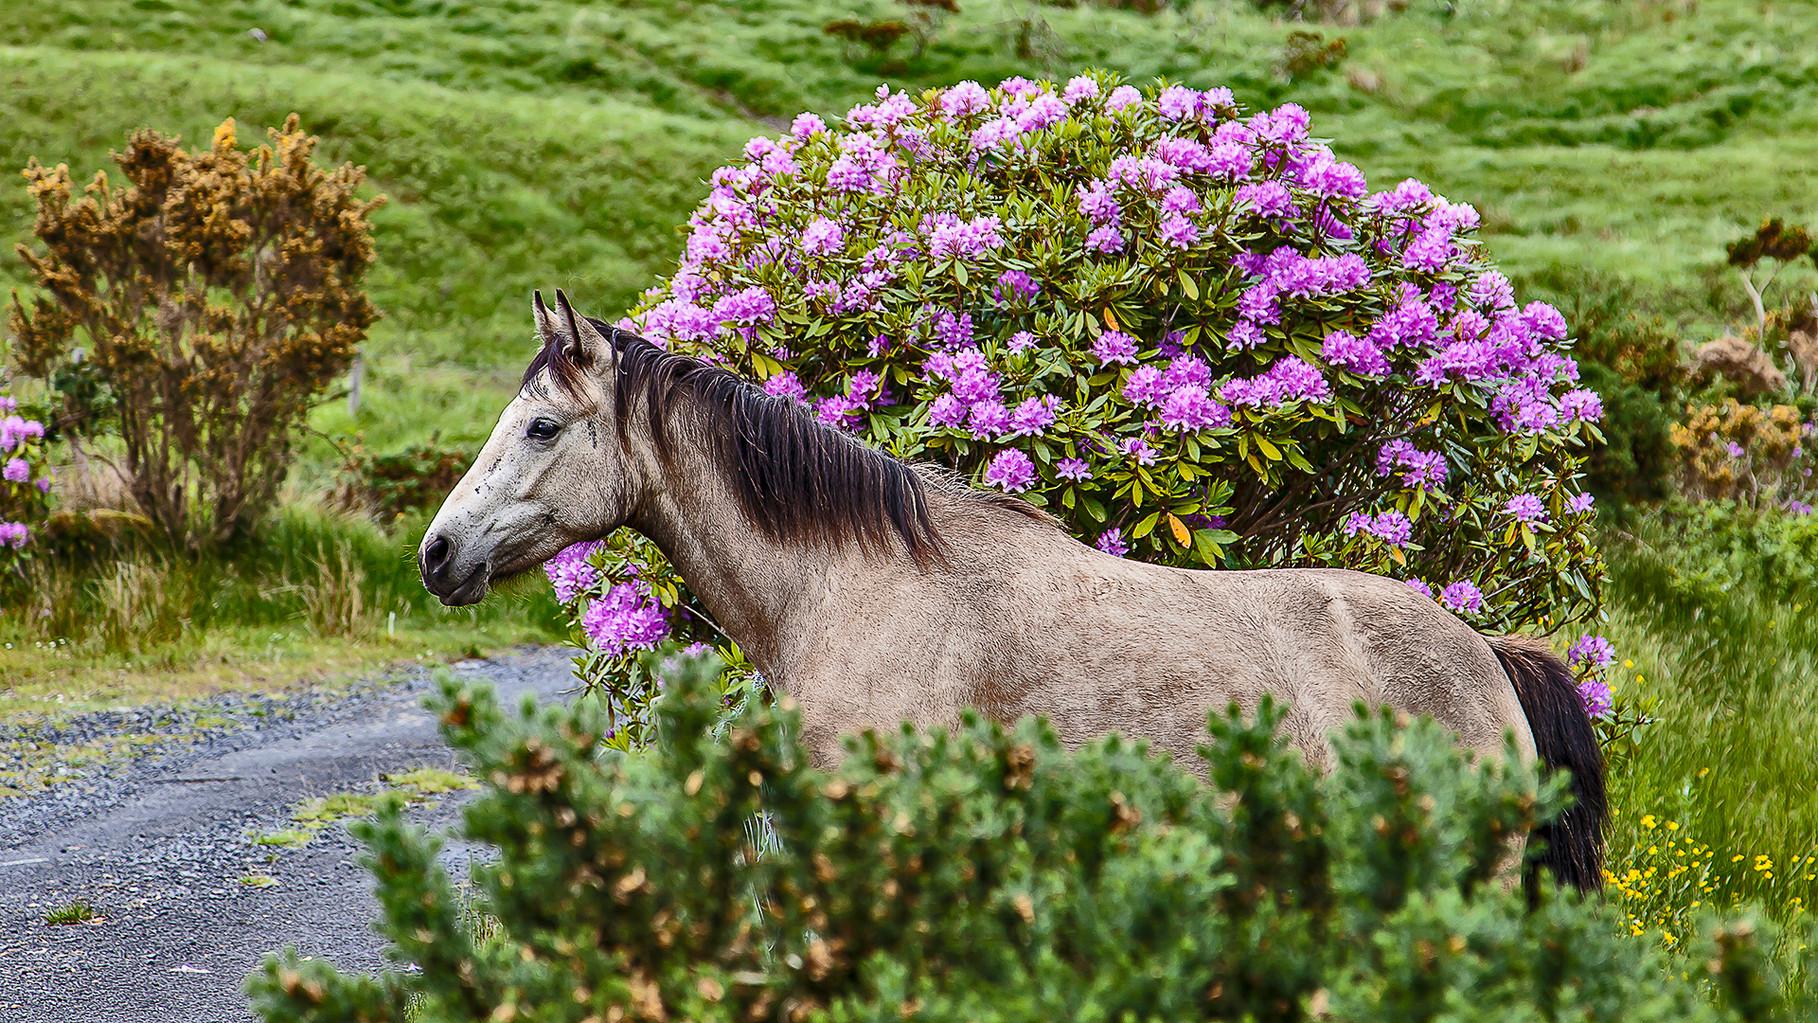 Horse at Ashleagh falls, Connemara, County Galway